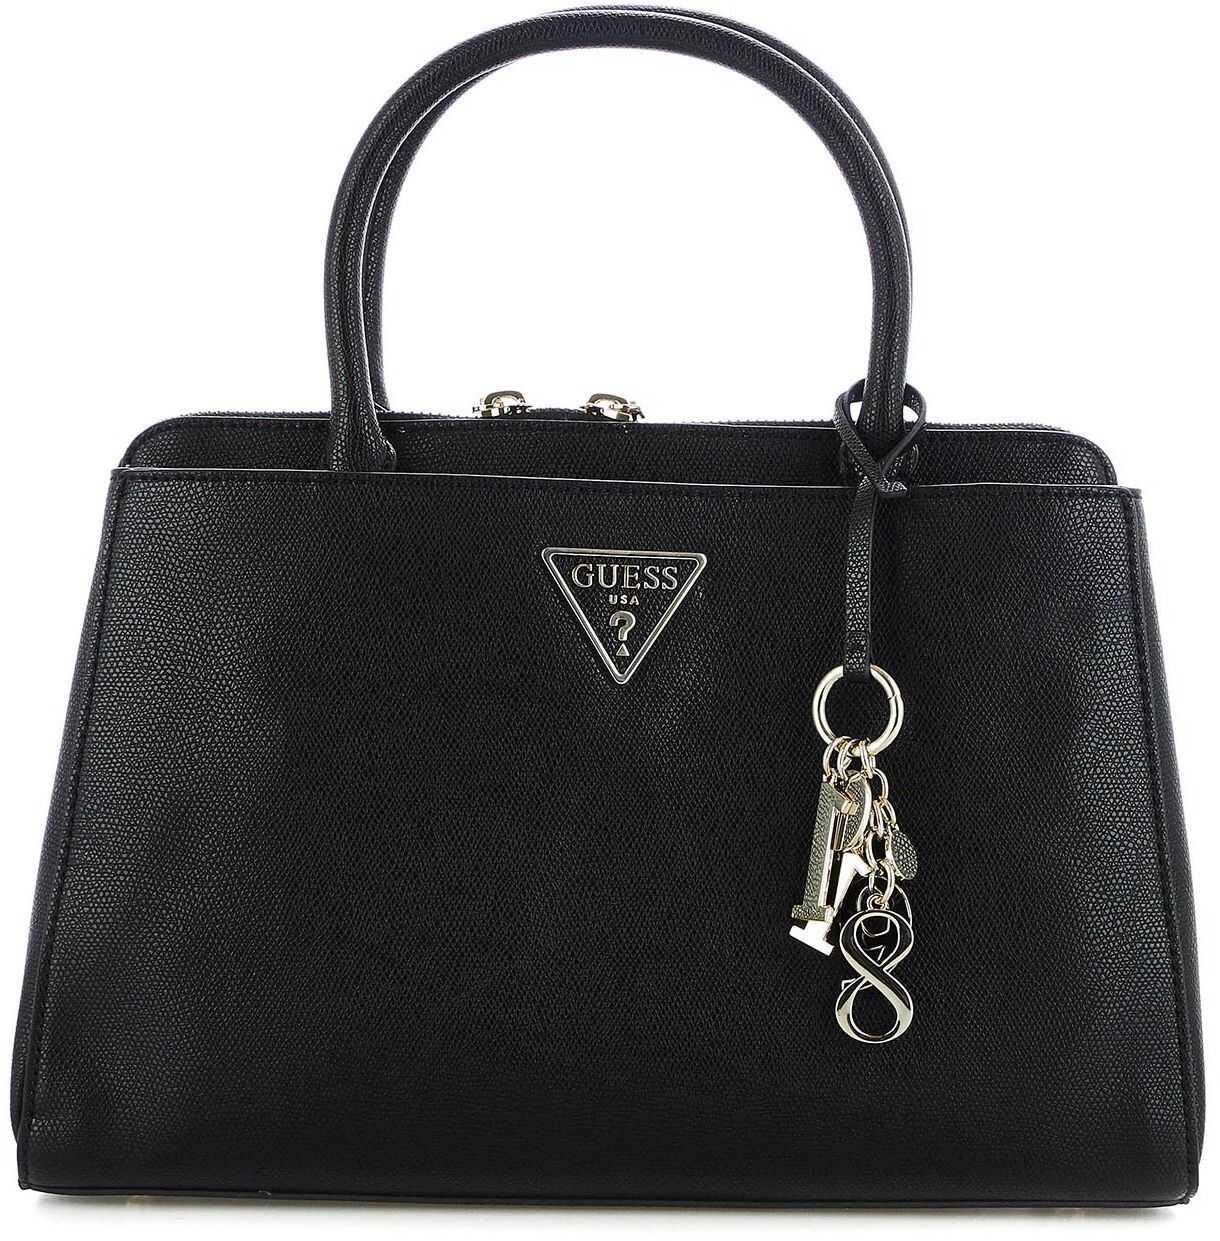 GUESS Hand bag Black